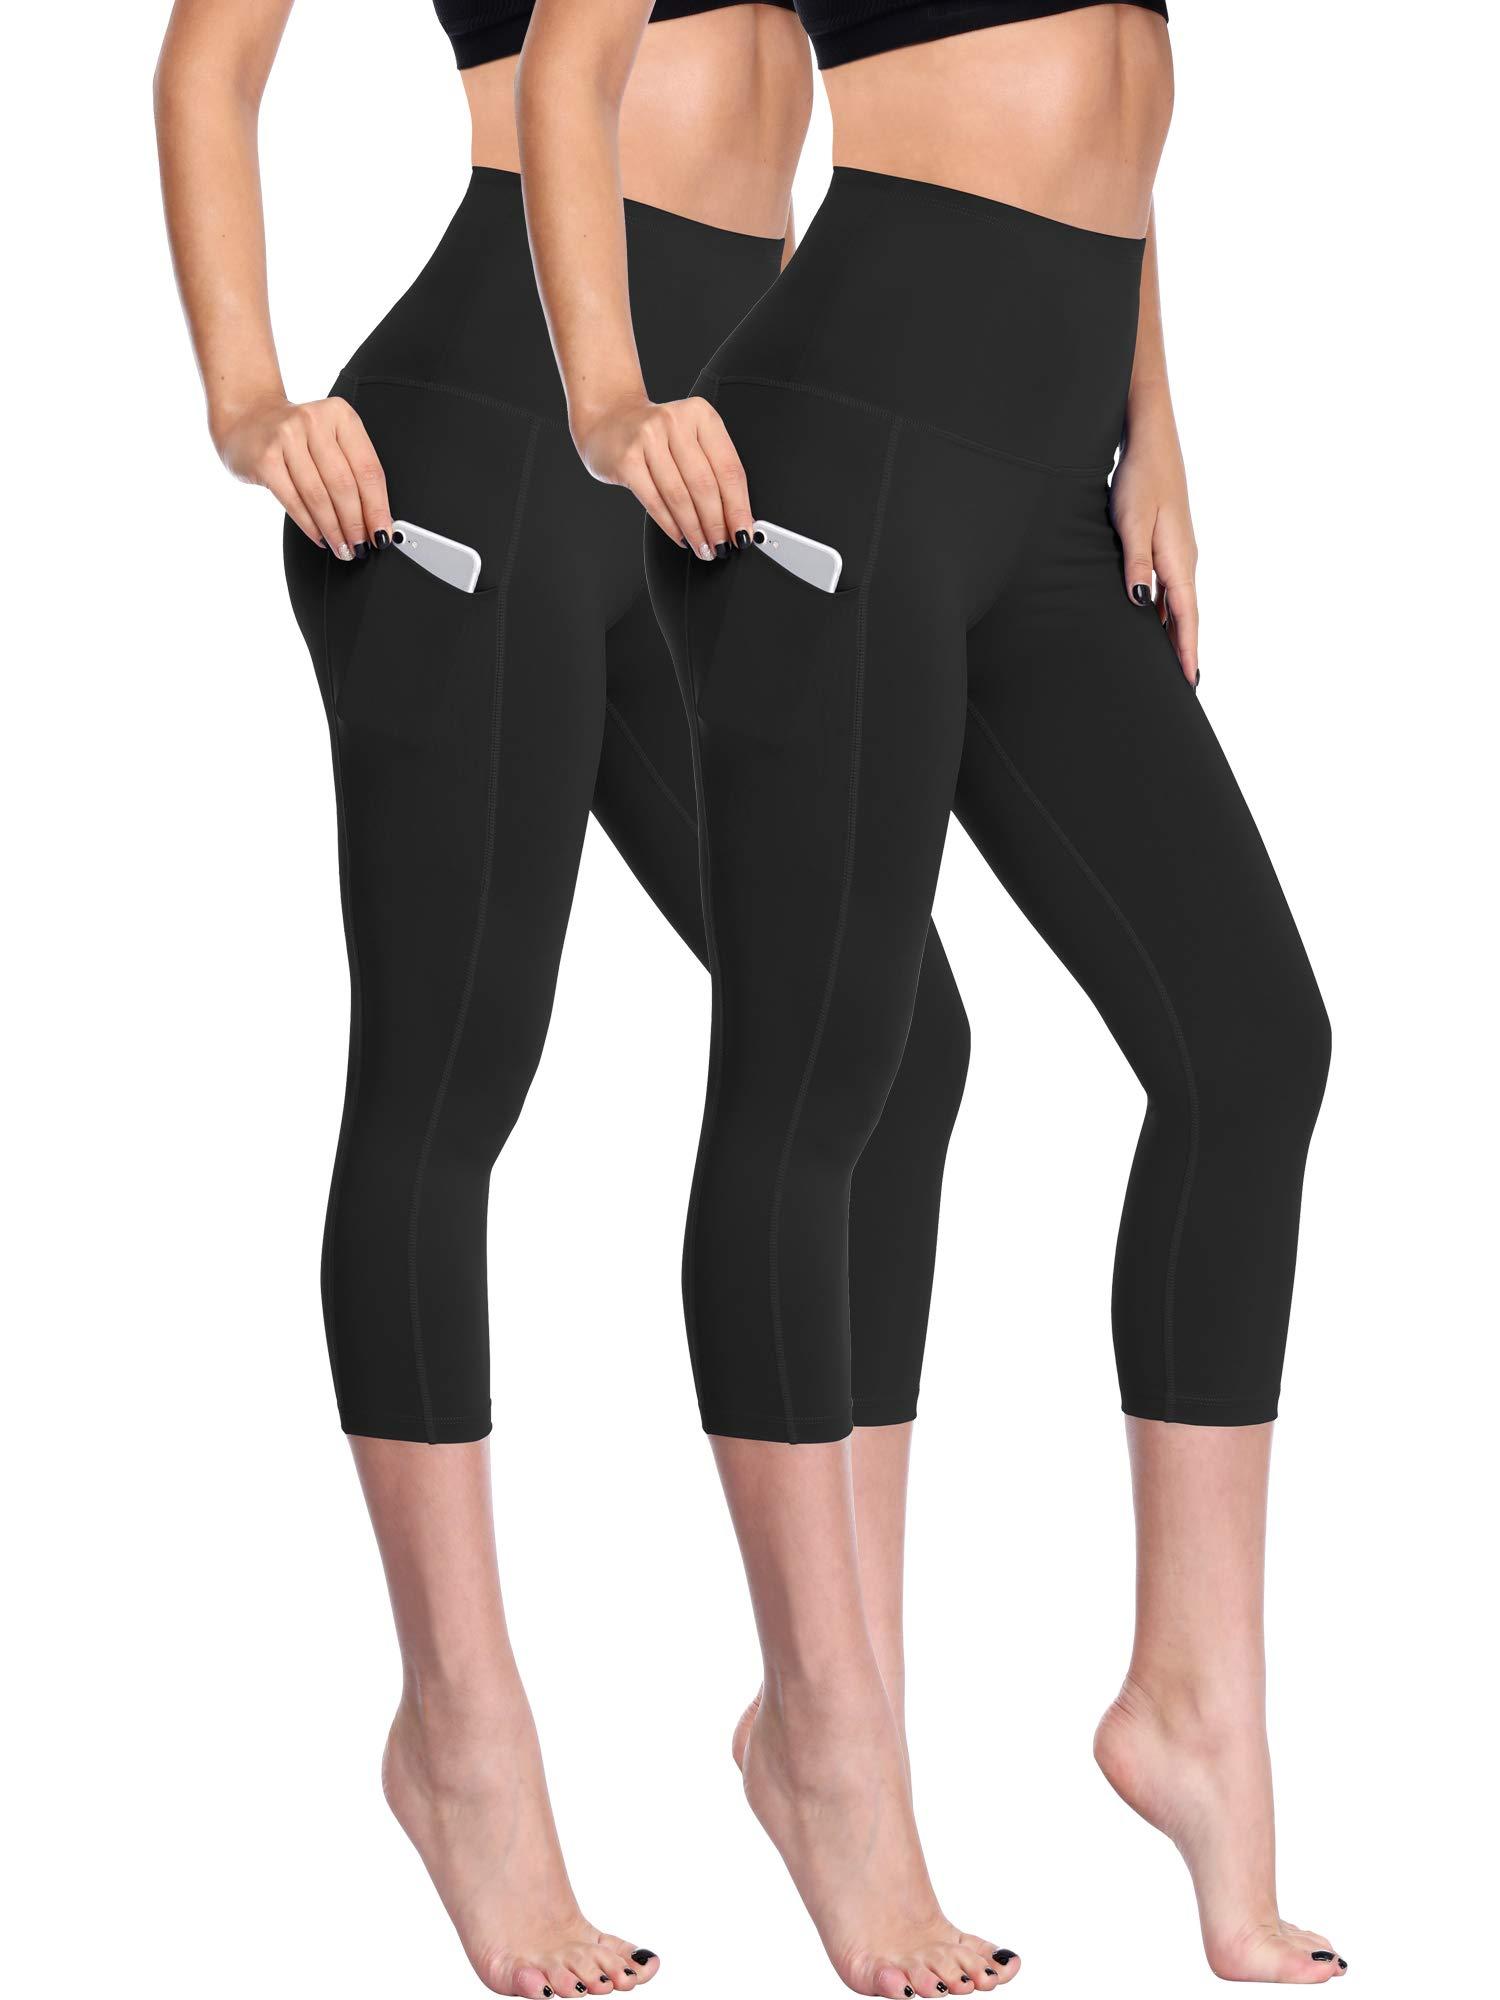 Neleus Women's 2 Pack Tummy Control High Waist Capris Leggings Yoga Pants with Two Pockets,109,Black,Black,2XL by Neleus